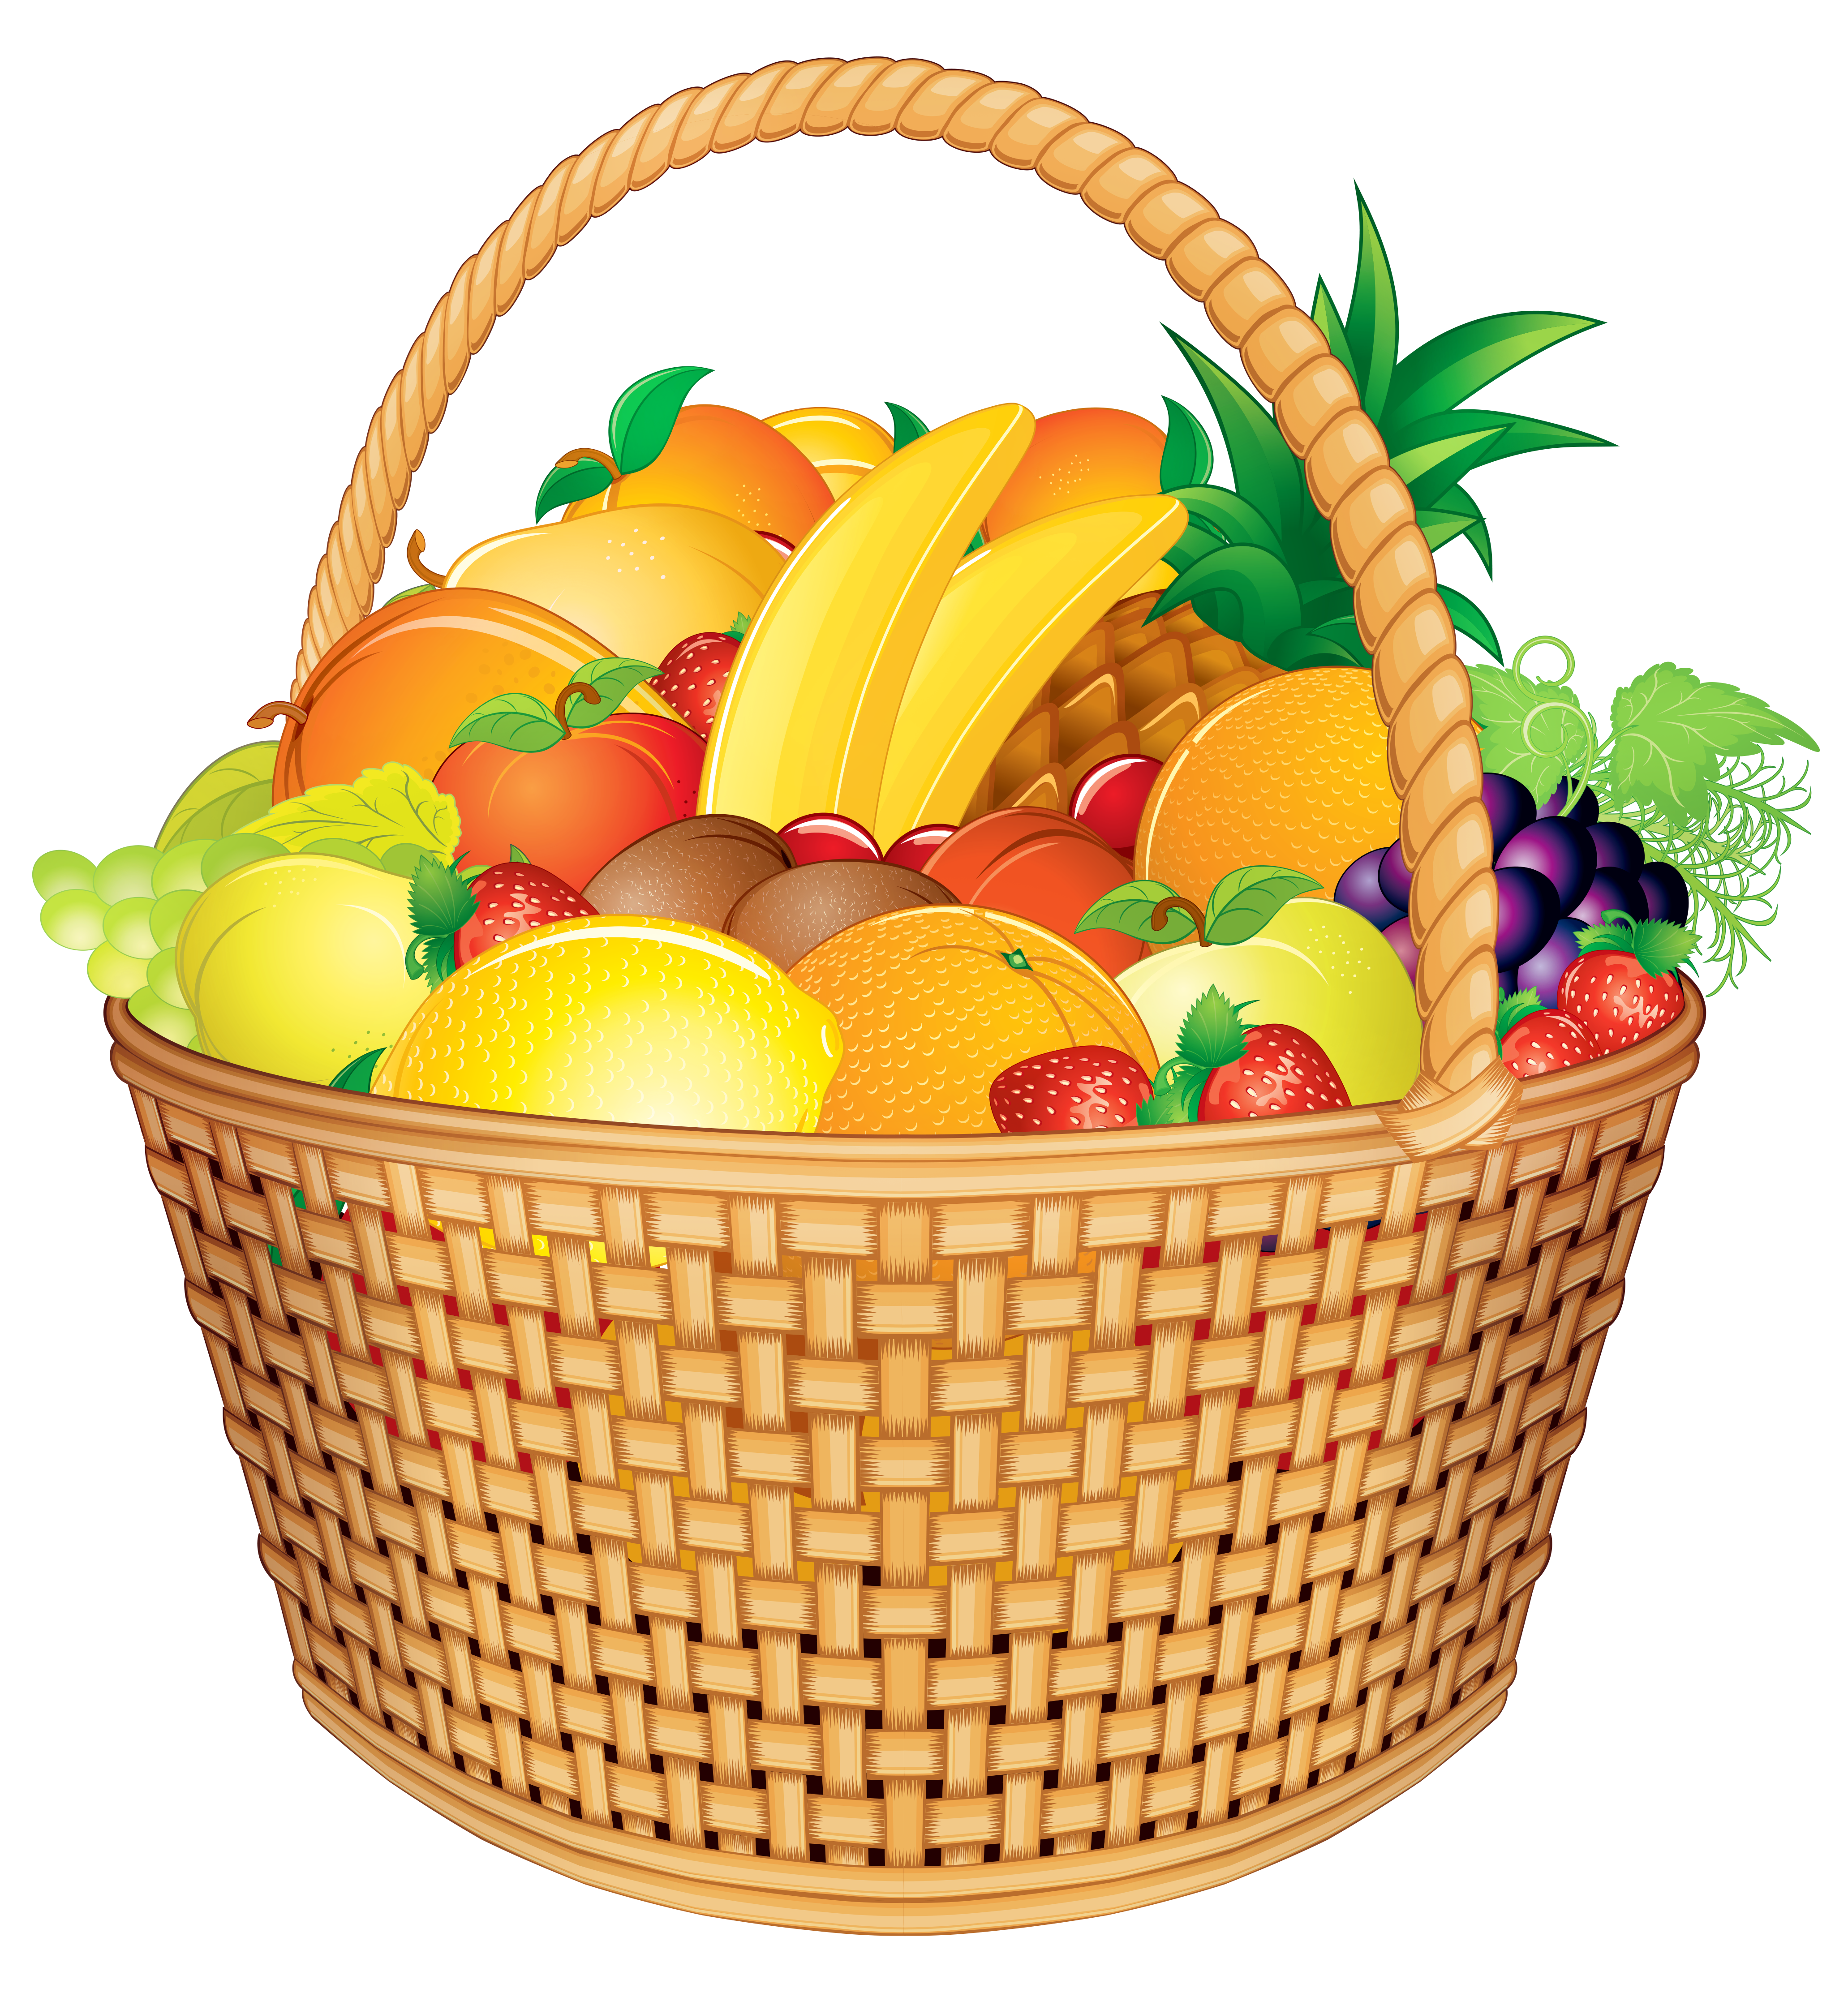 Christmas baskets clipart jpg royalty free download Gift Basket PNG HD Transparent Gift Basket HD.PNG Images. | PlusPNG jpg royalty free download